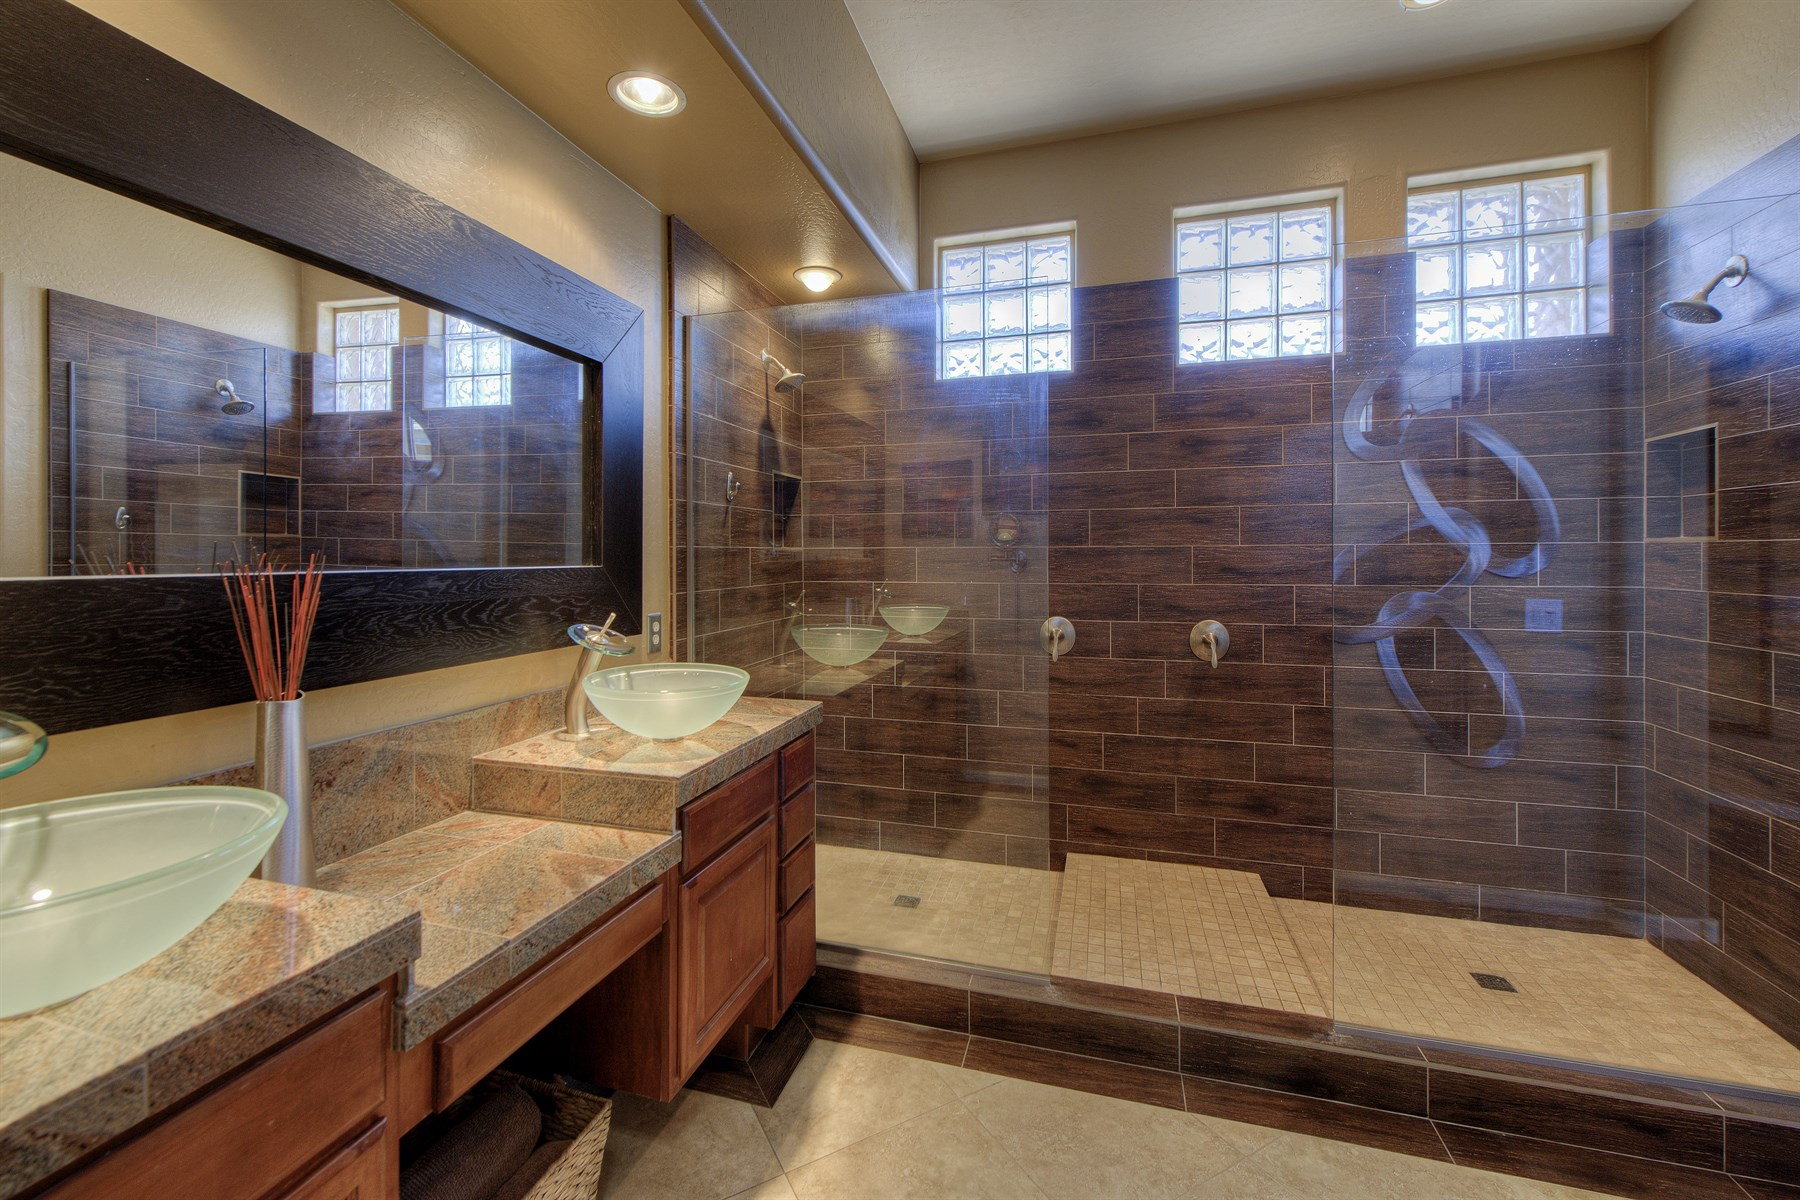 獨棟家庭住宅 為 出售 在 Gorgeous, move in ready single story home. 9518 E MOHAWK LN Scottsdale, 亞利桑那州 85255 美國